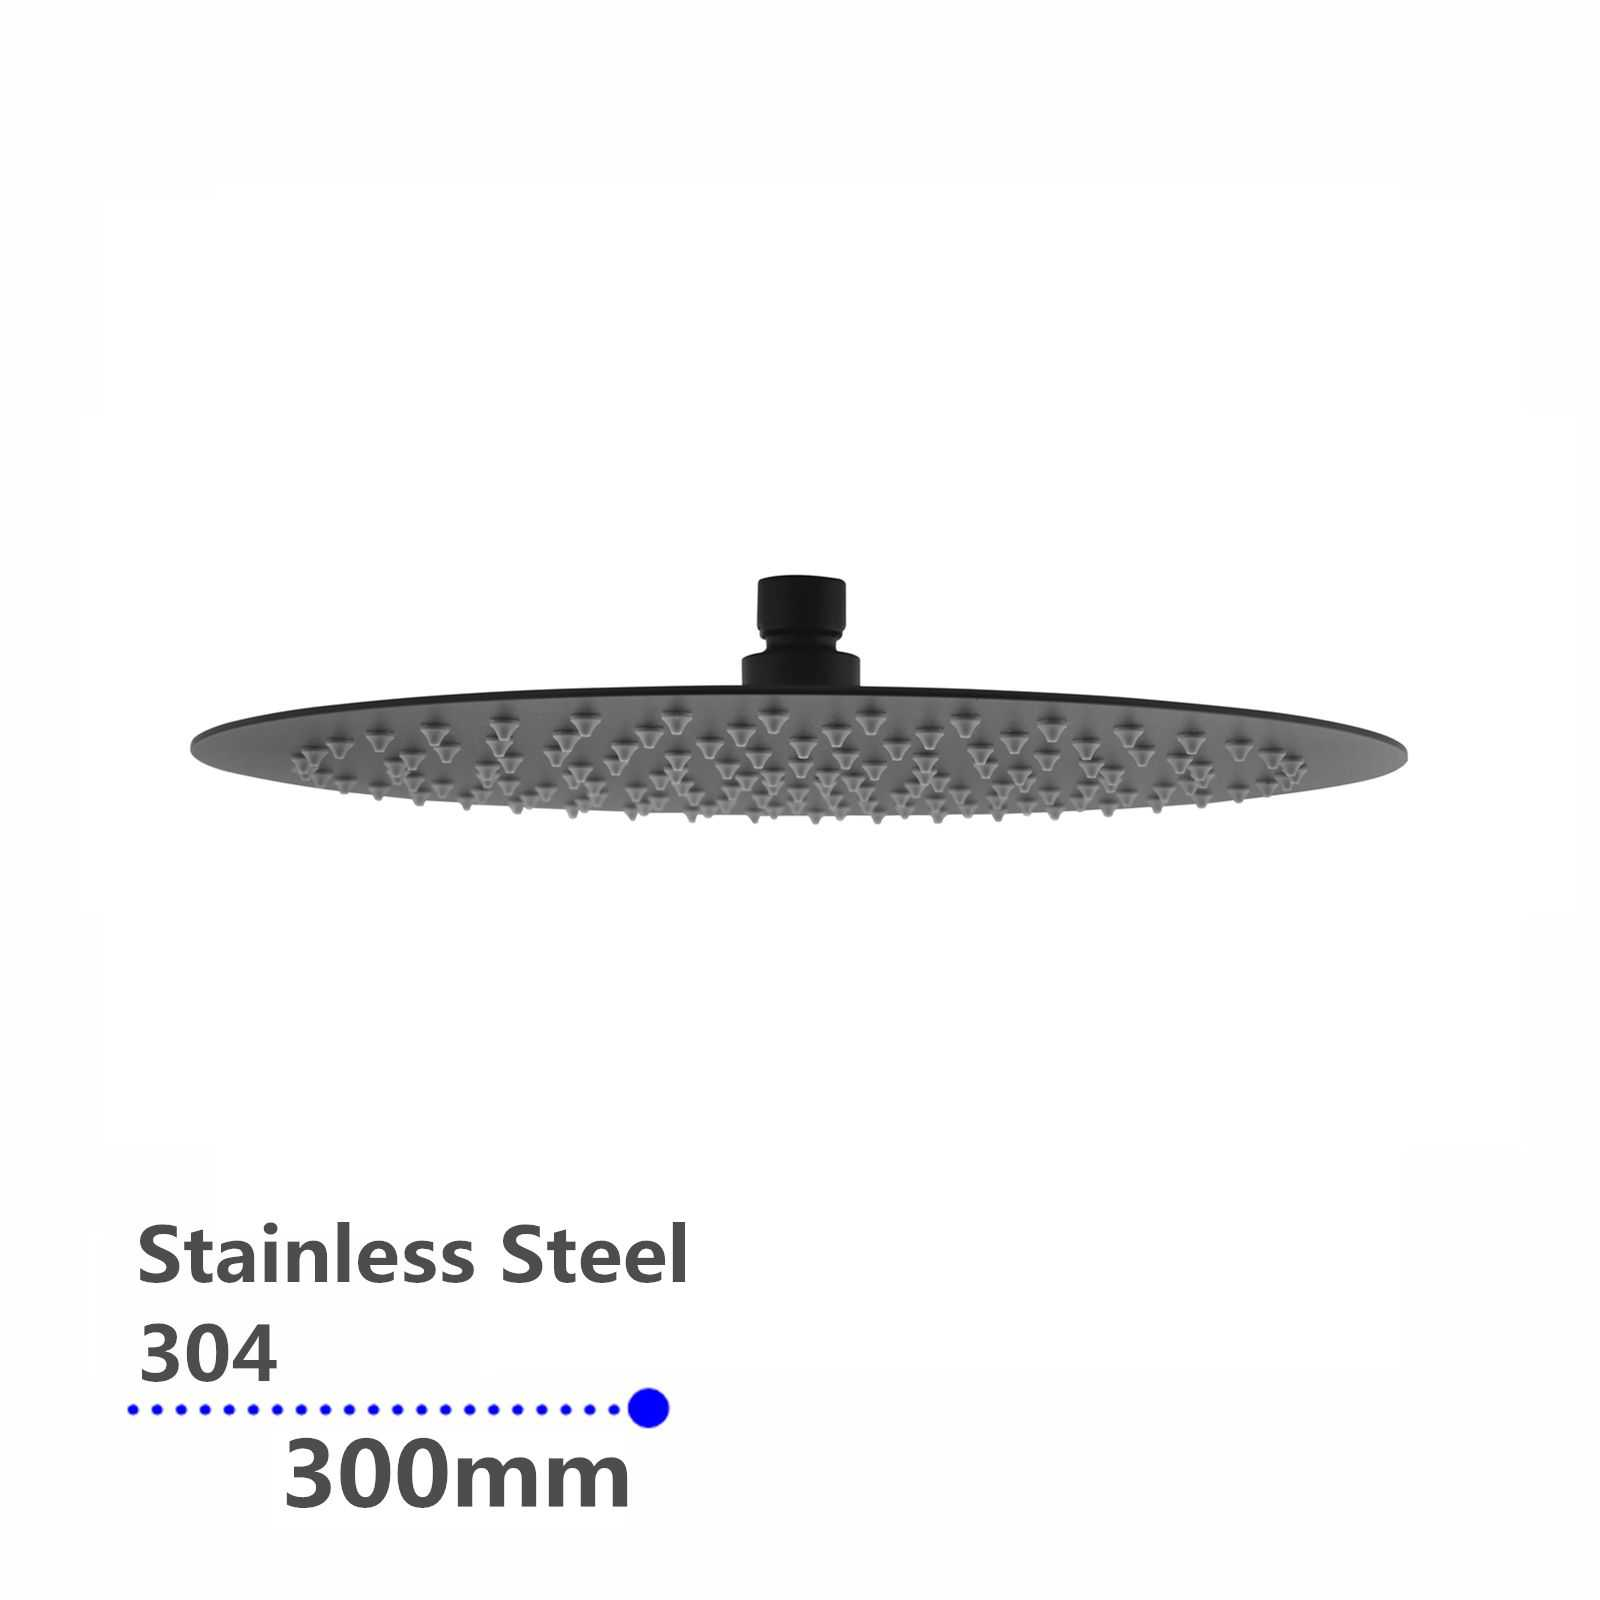 Super-slim Round Black Rainfall Shower Head 300mm